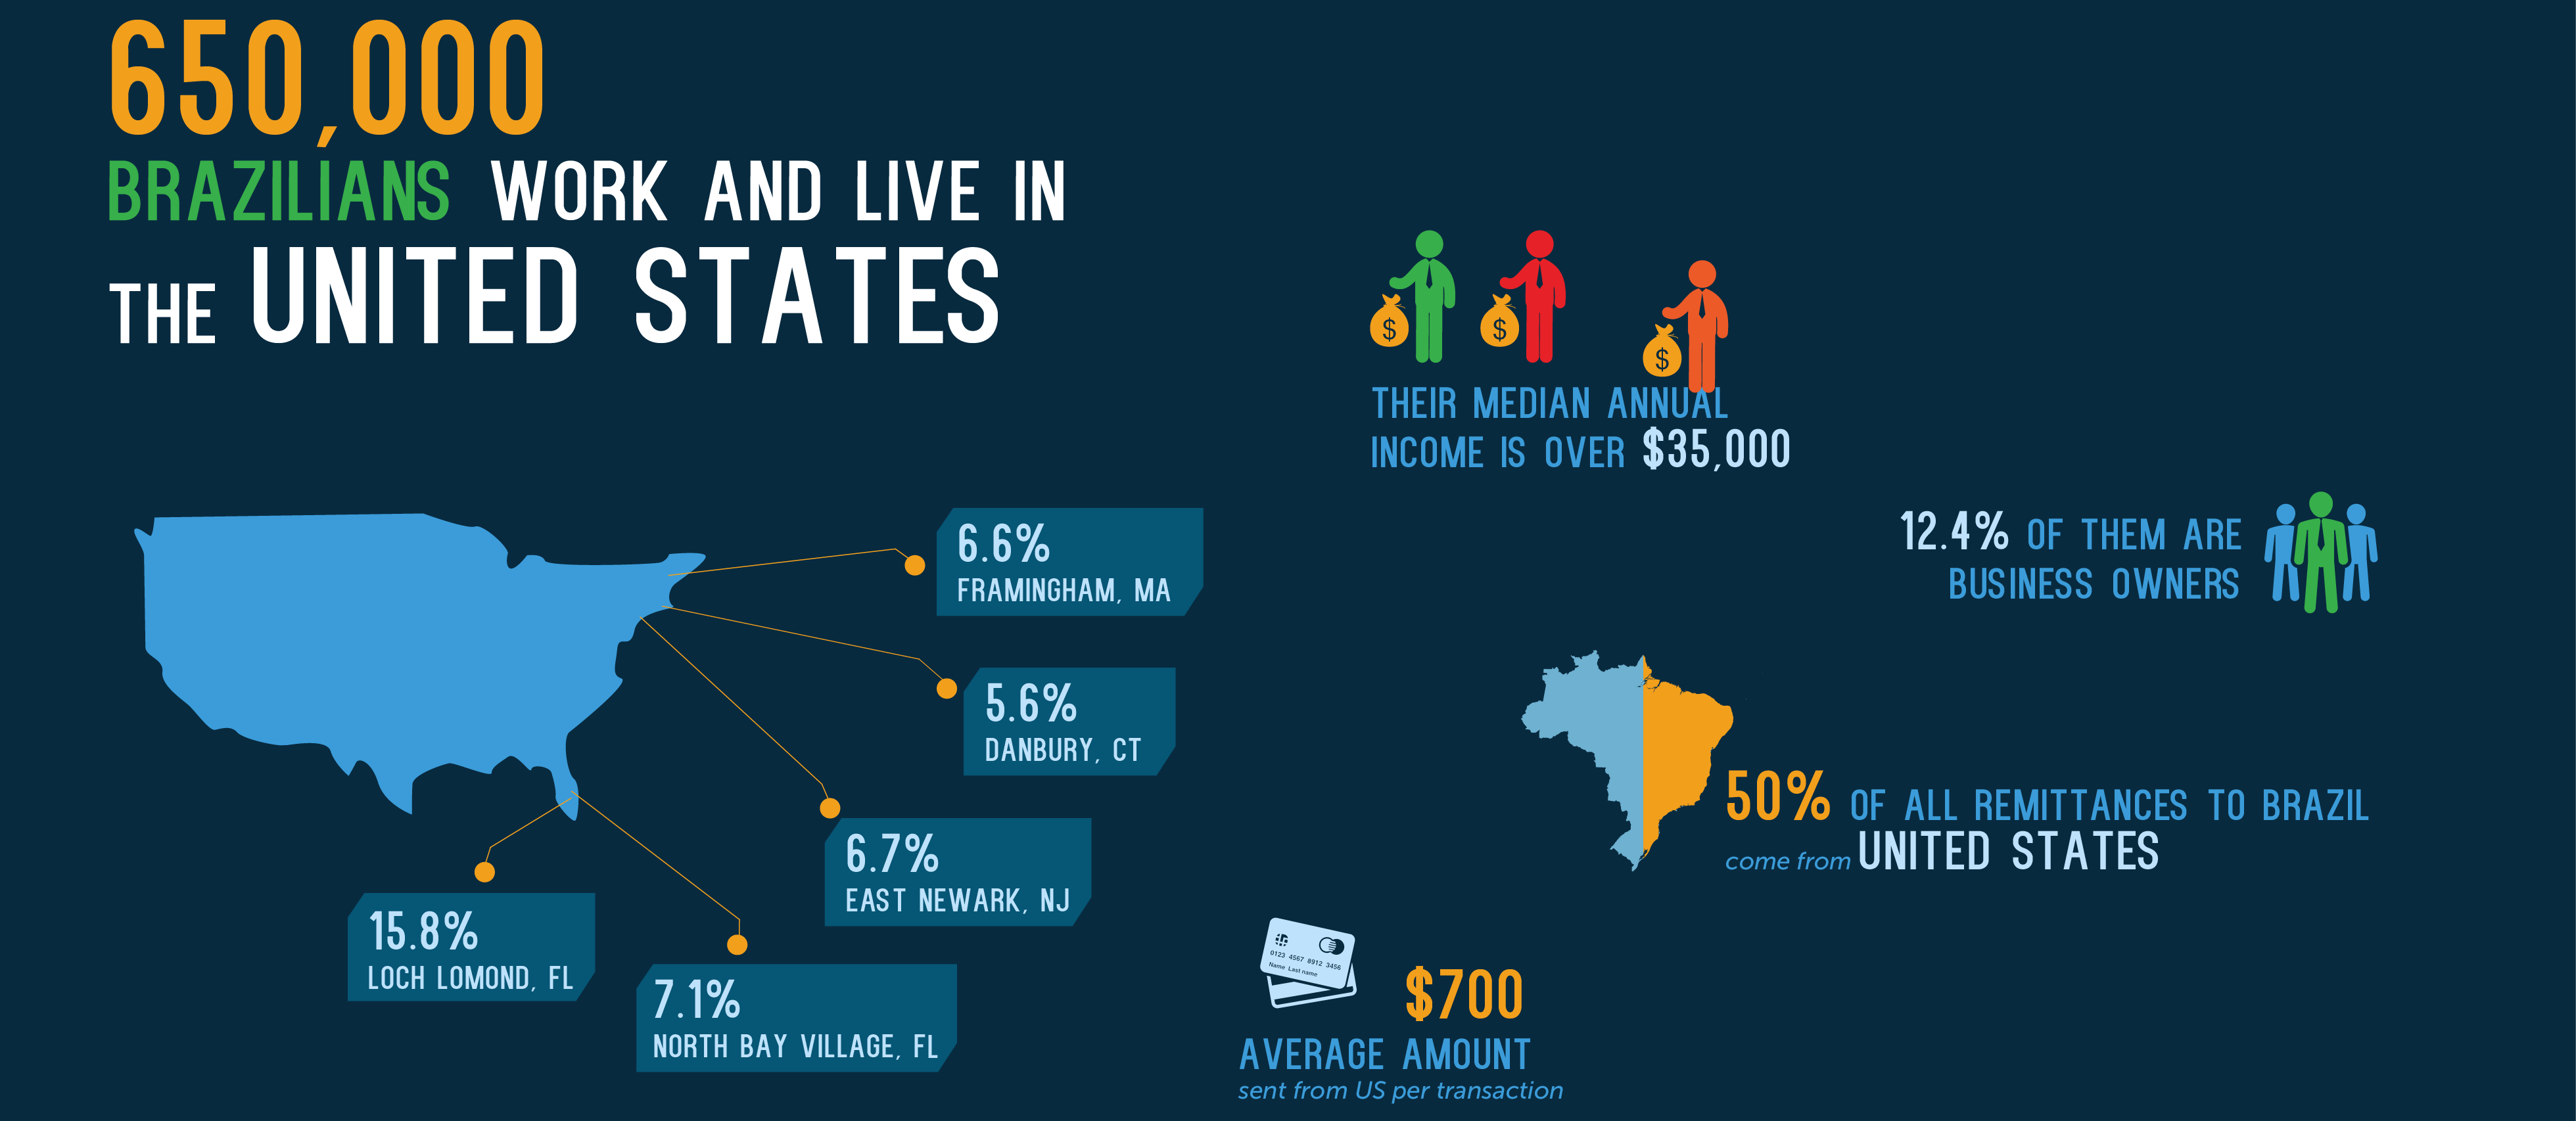 Send Money To The Brazil Infographic Visit Sharemoney